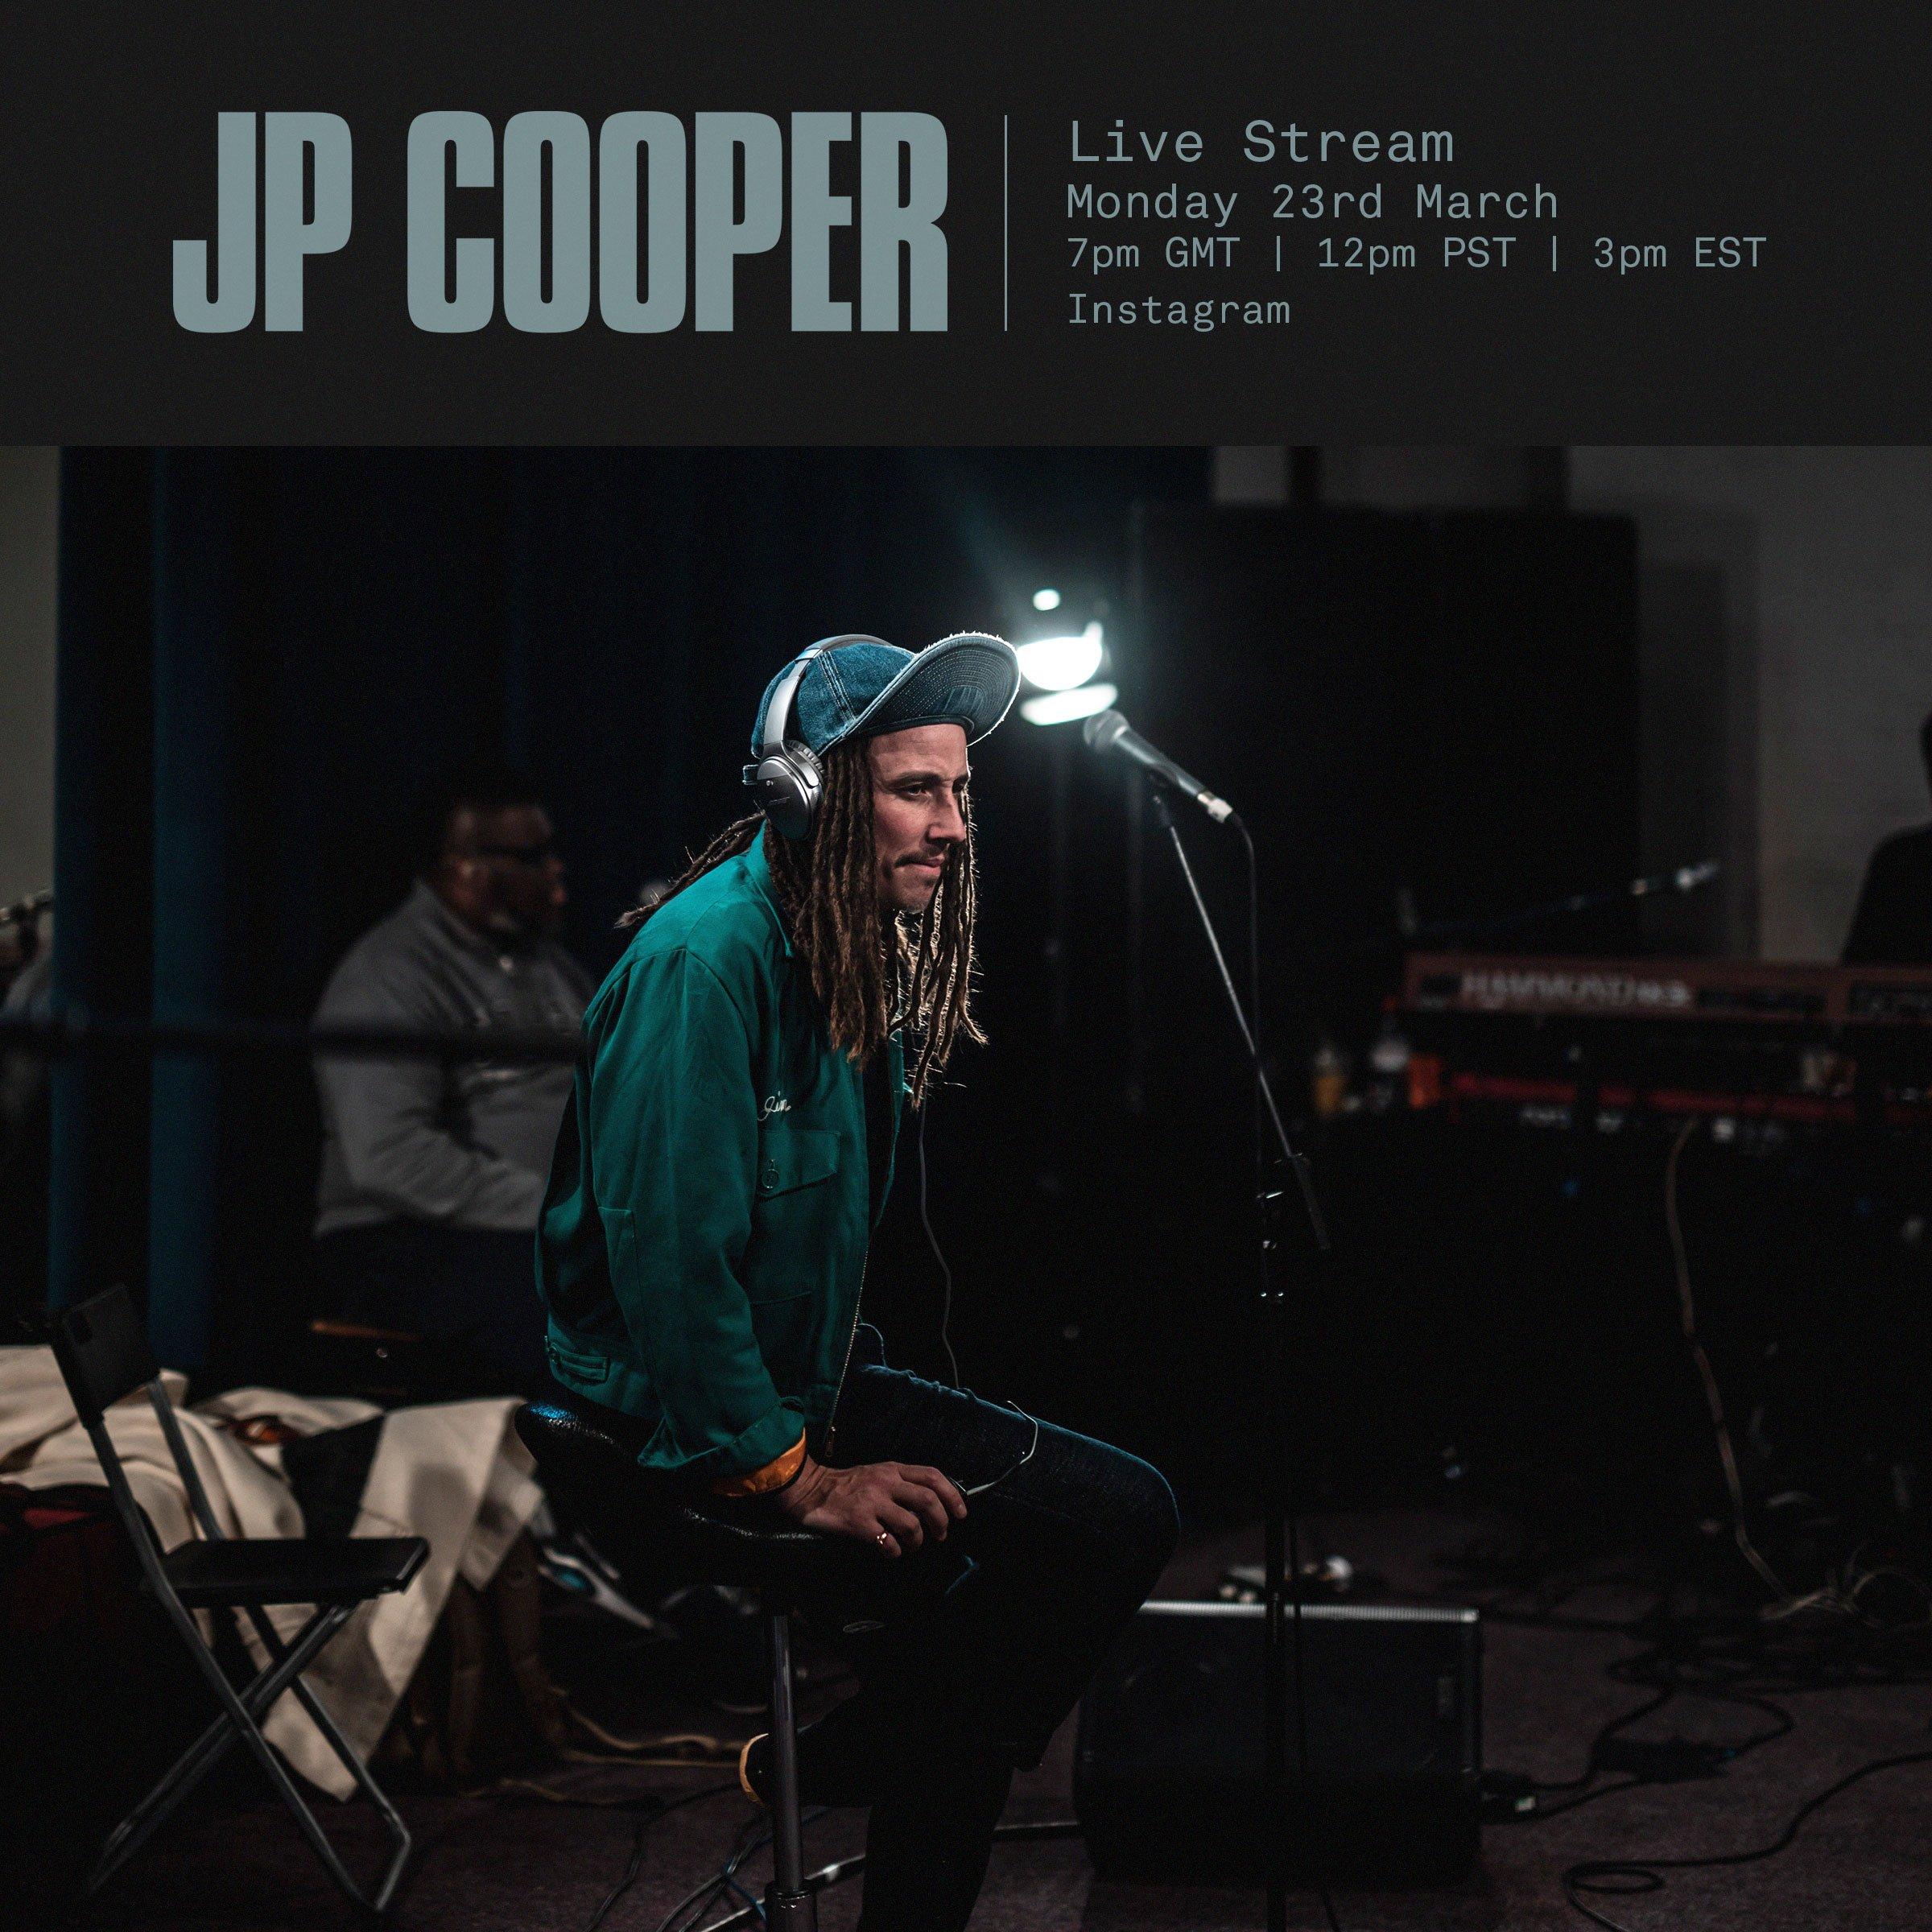 JP Cooper, Live stream, instagram, Covid19, 360 Magazine, Vaughn Lowery